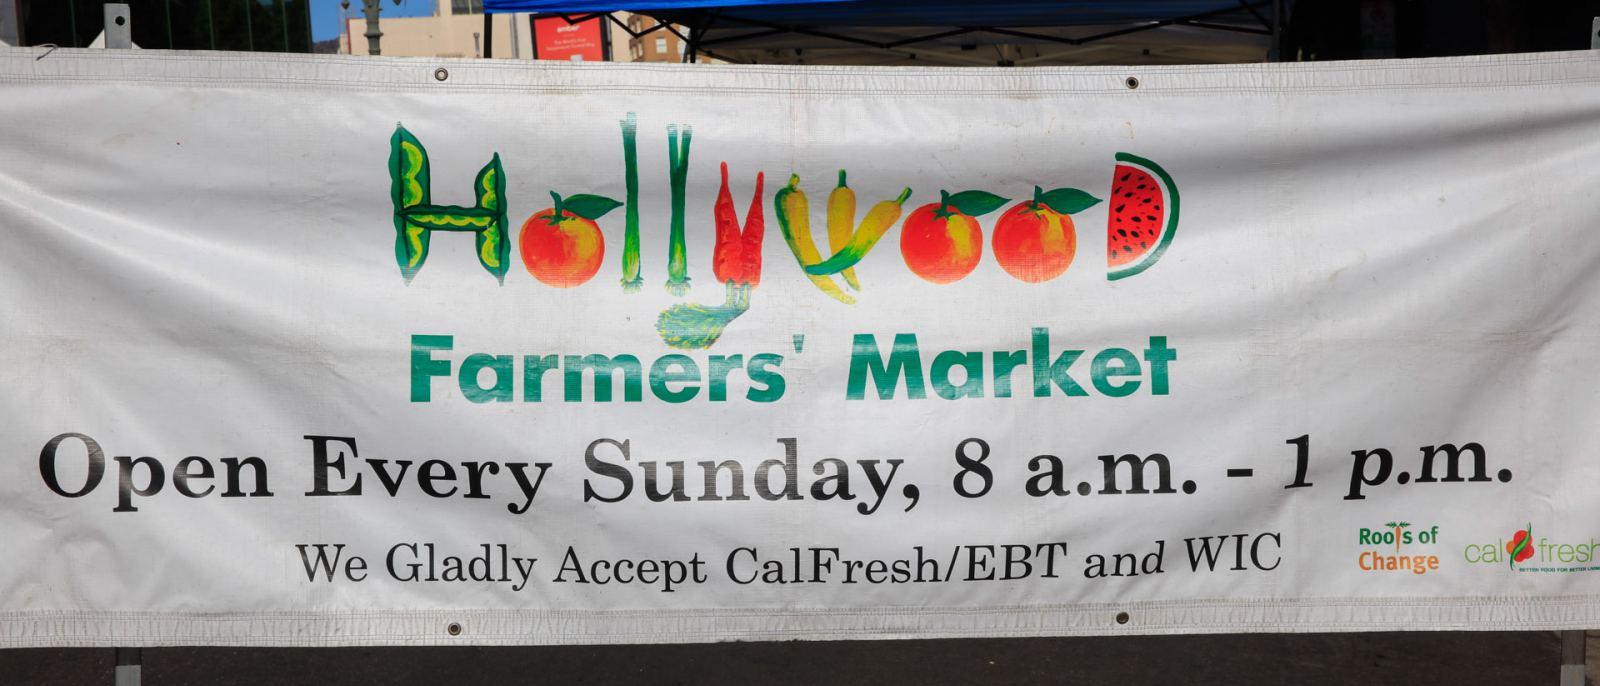 Holywood Farmers Market